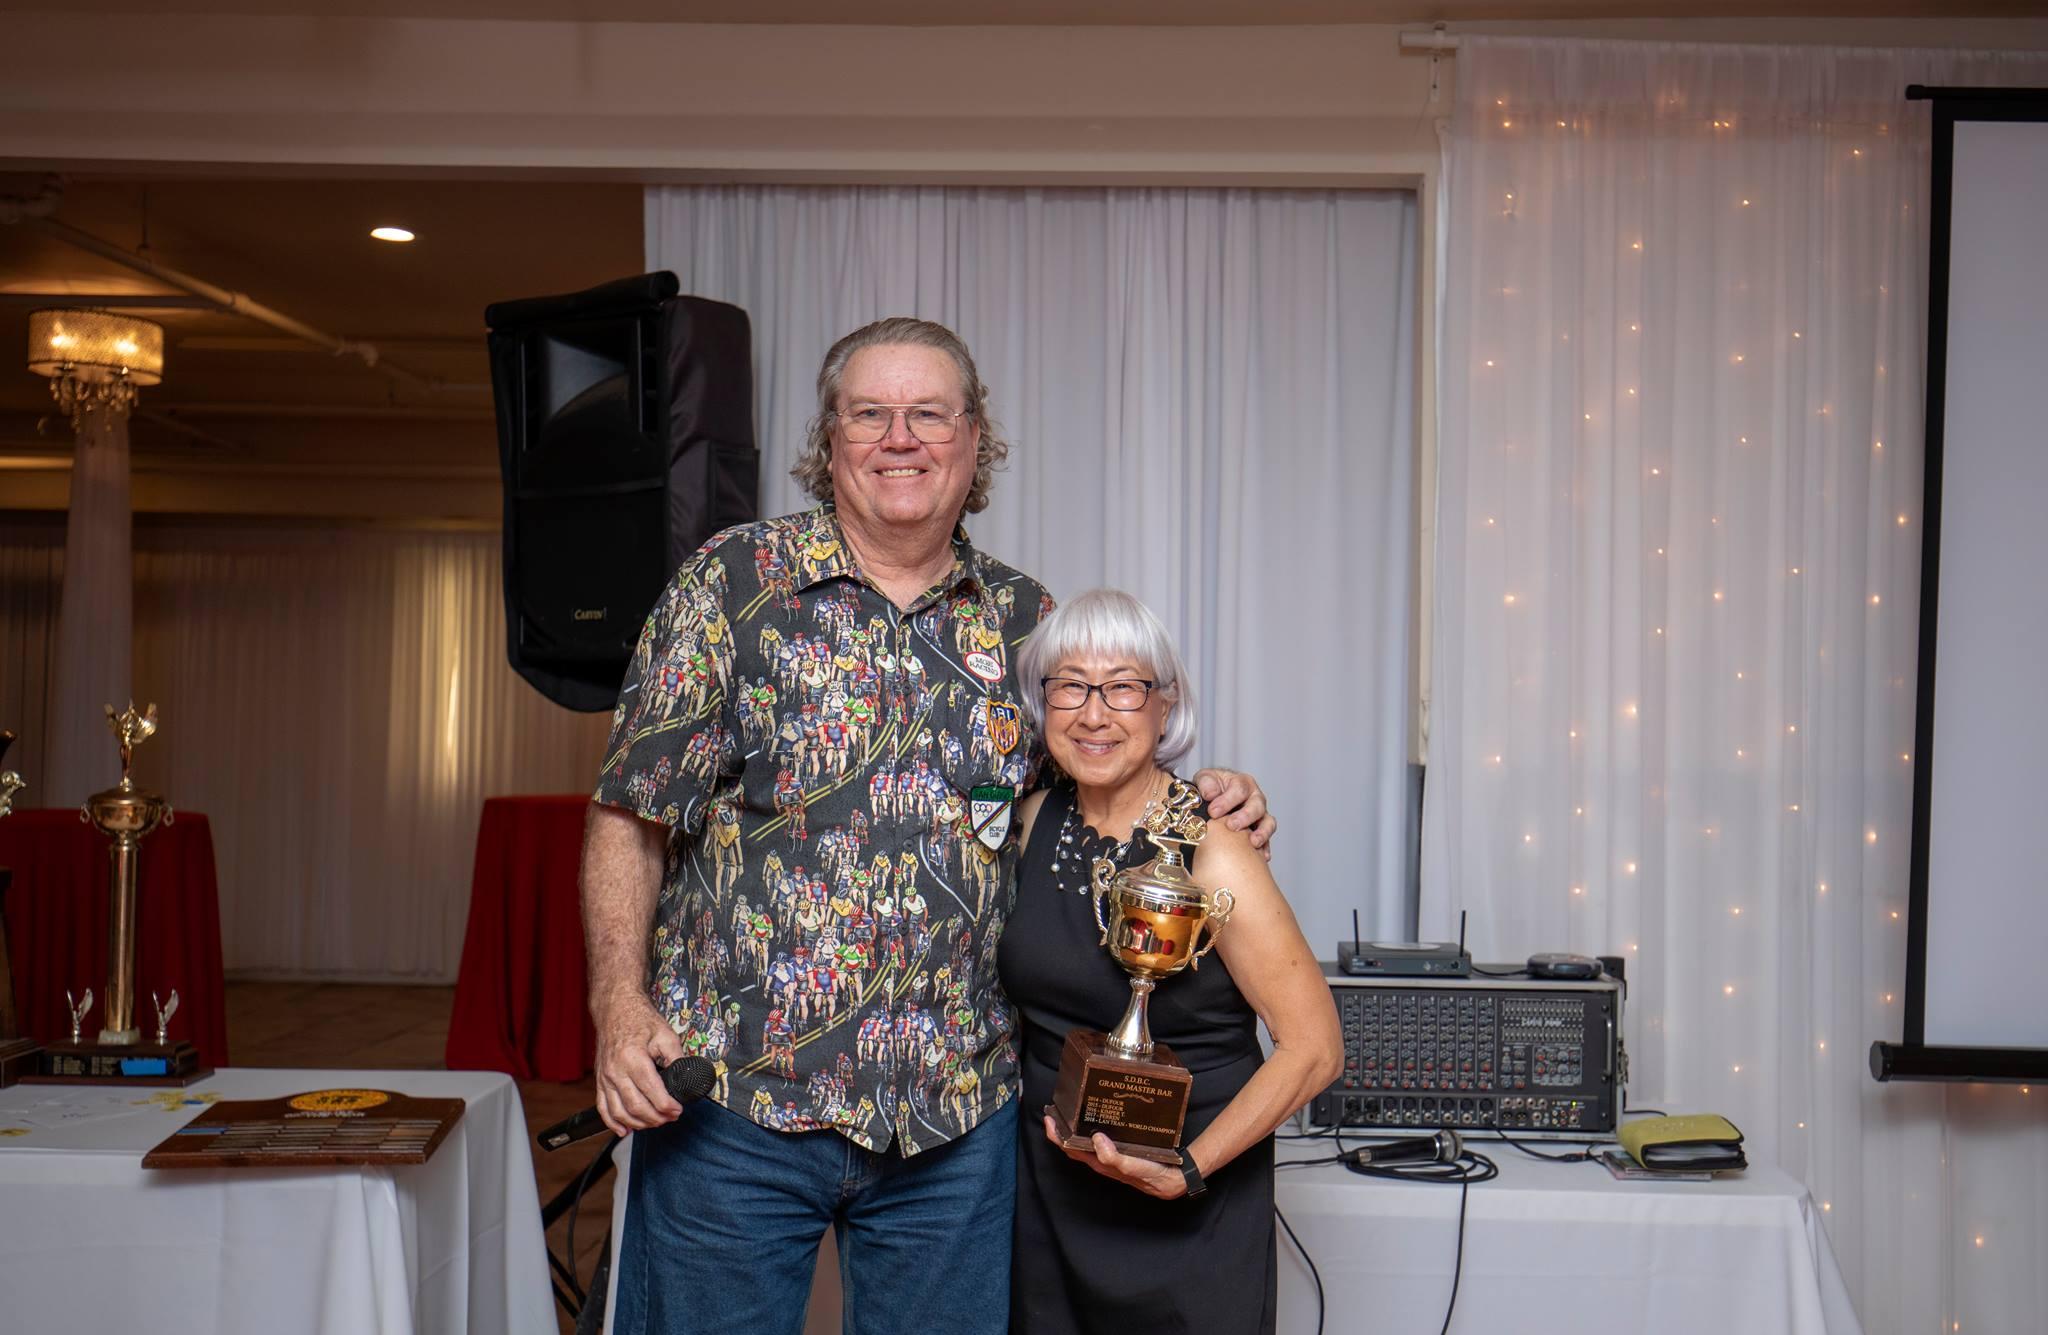 2018 Best Annual Rider - Grand Master (55+)